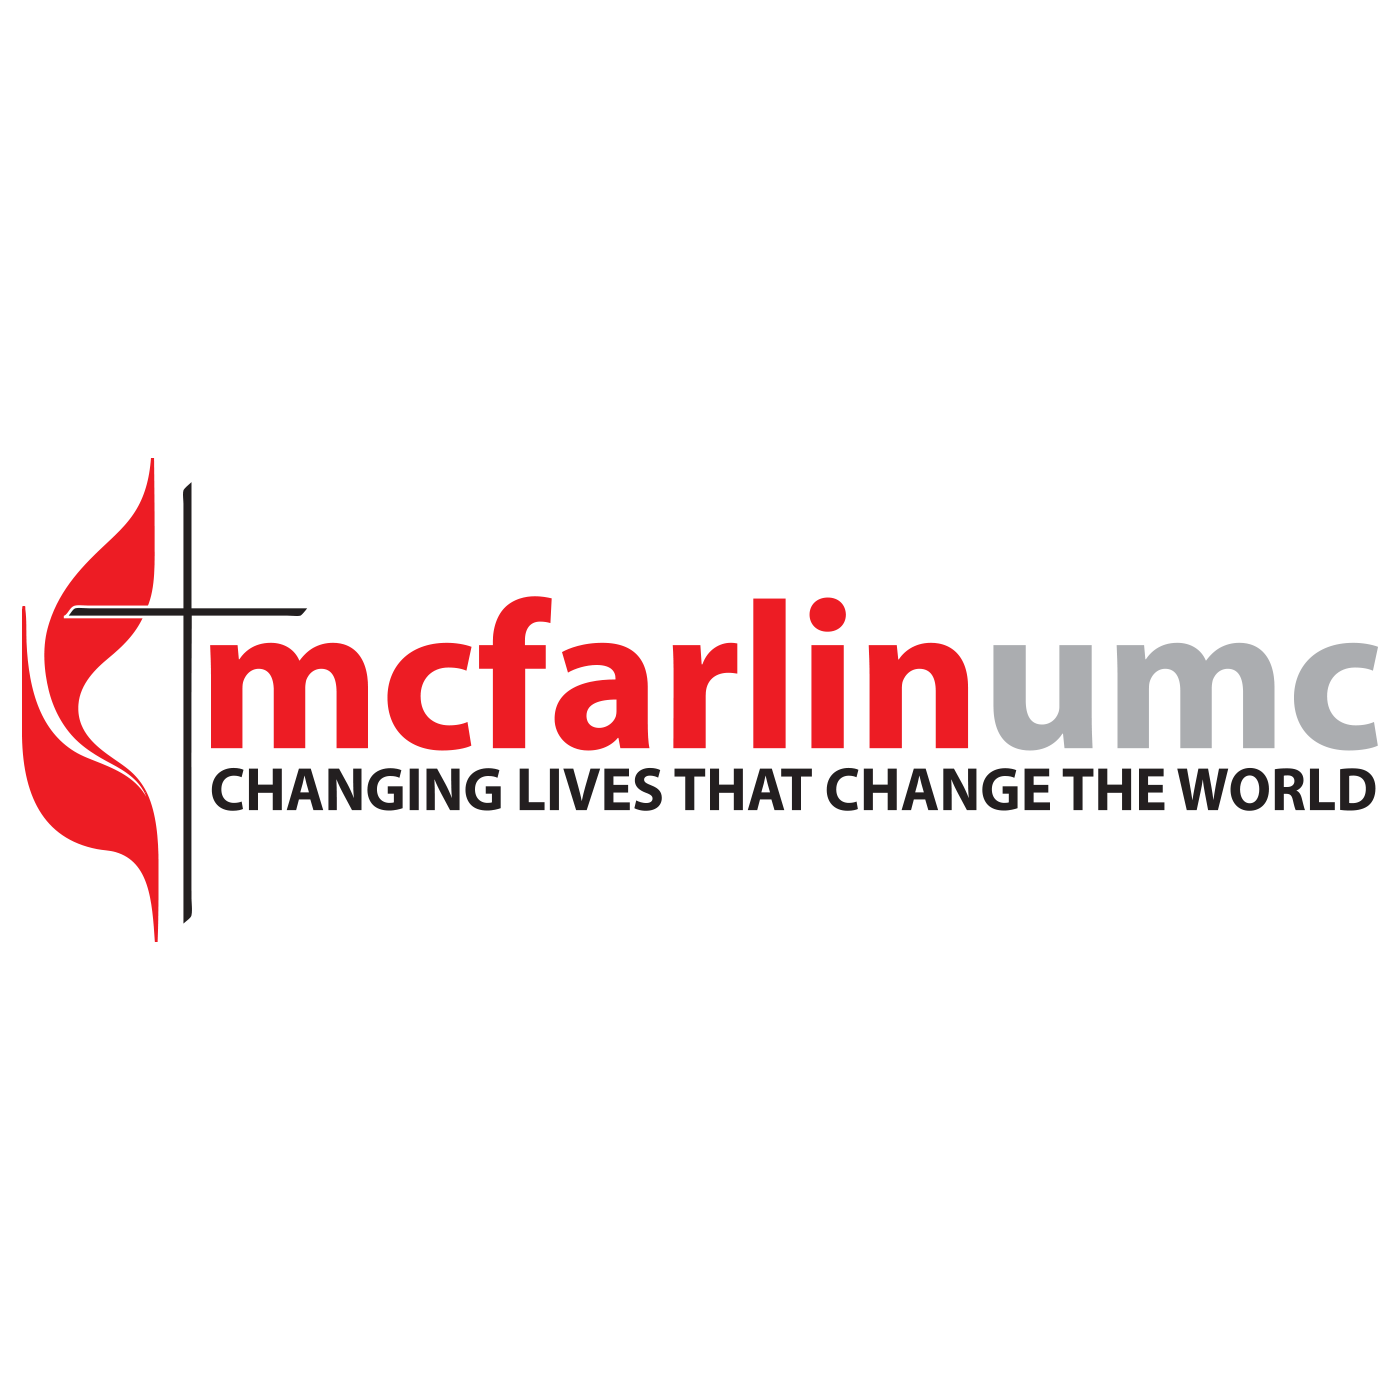 McFarlin Memorial United Methodist Church